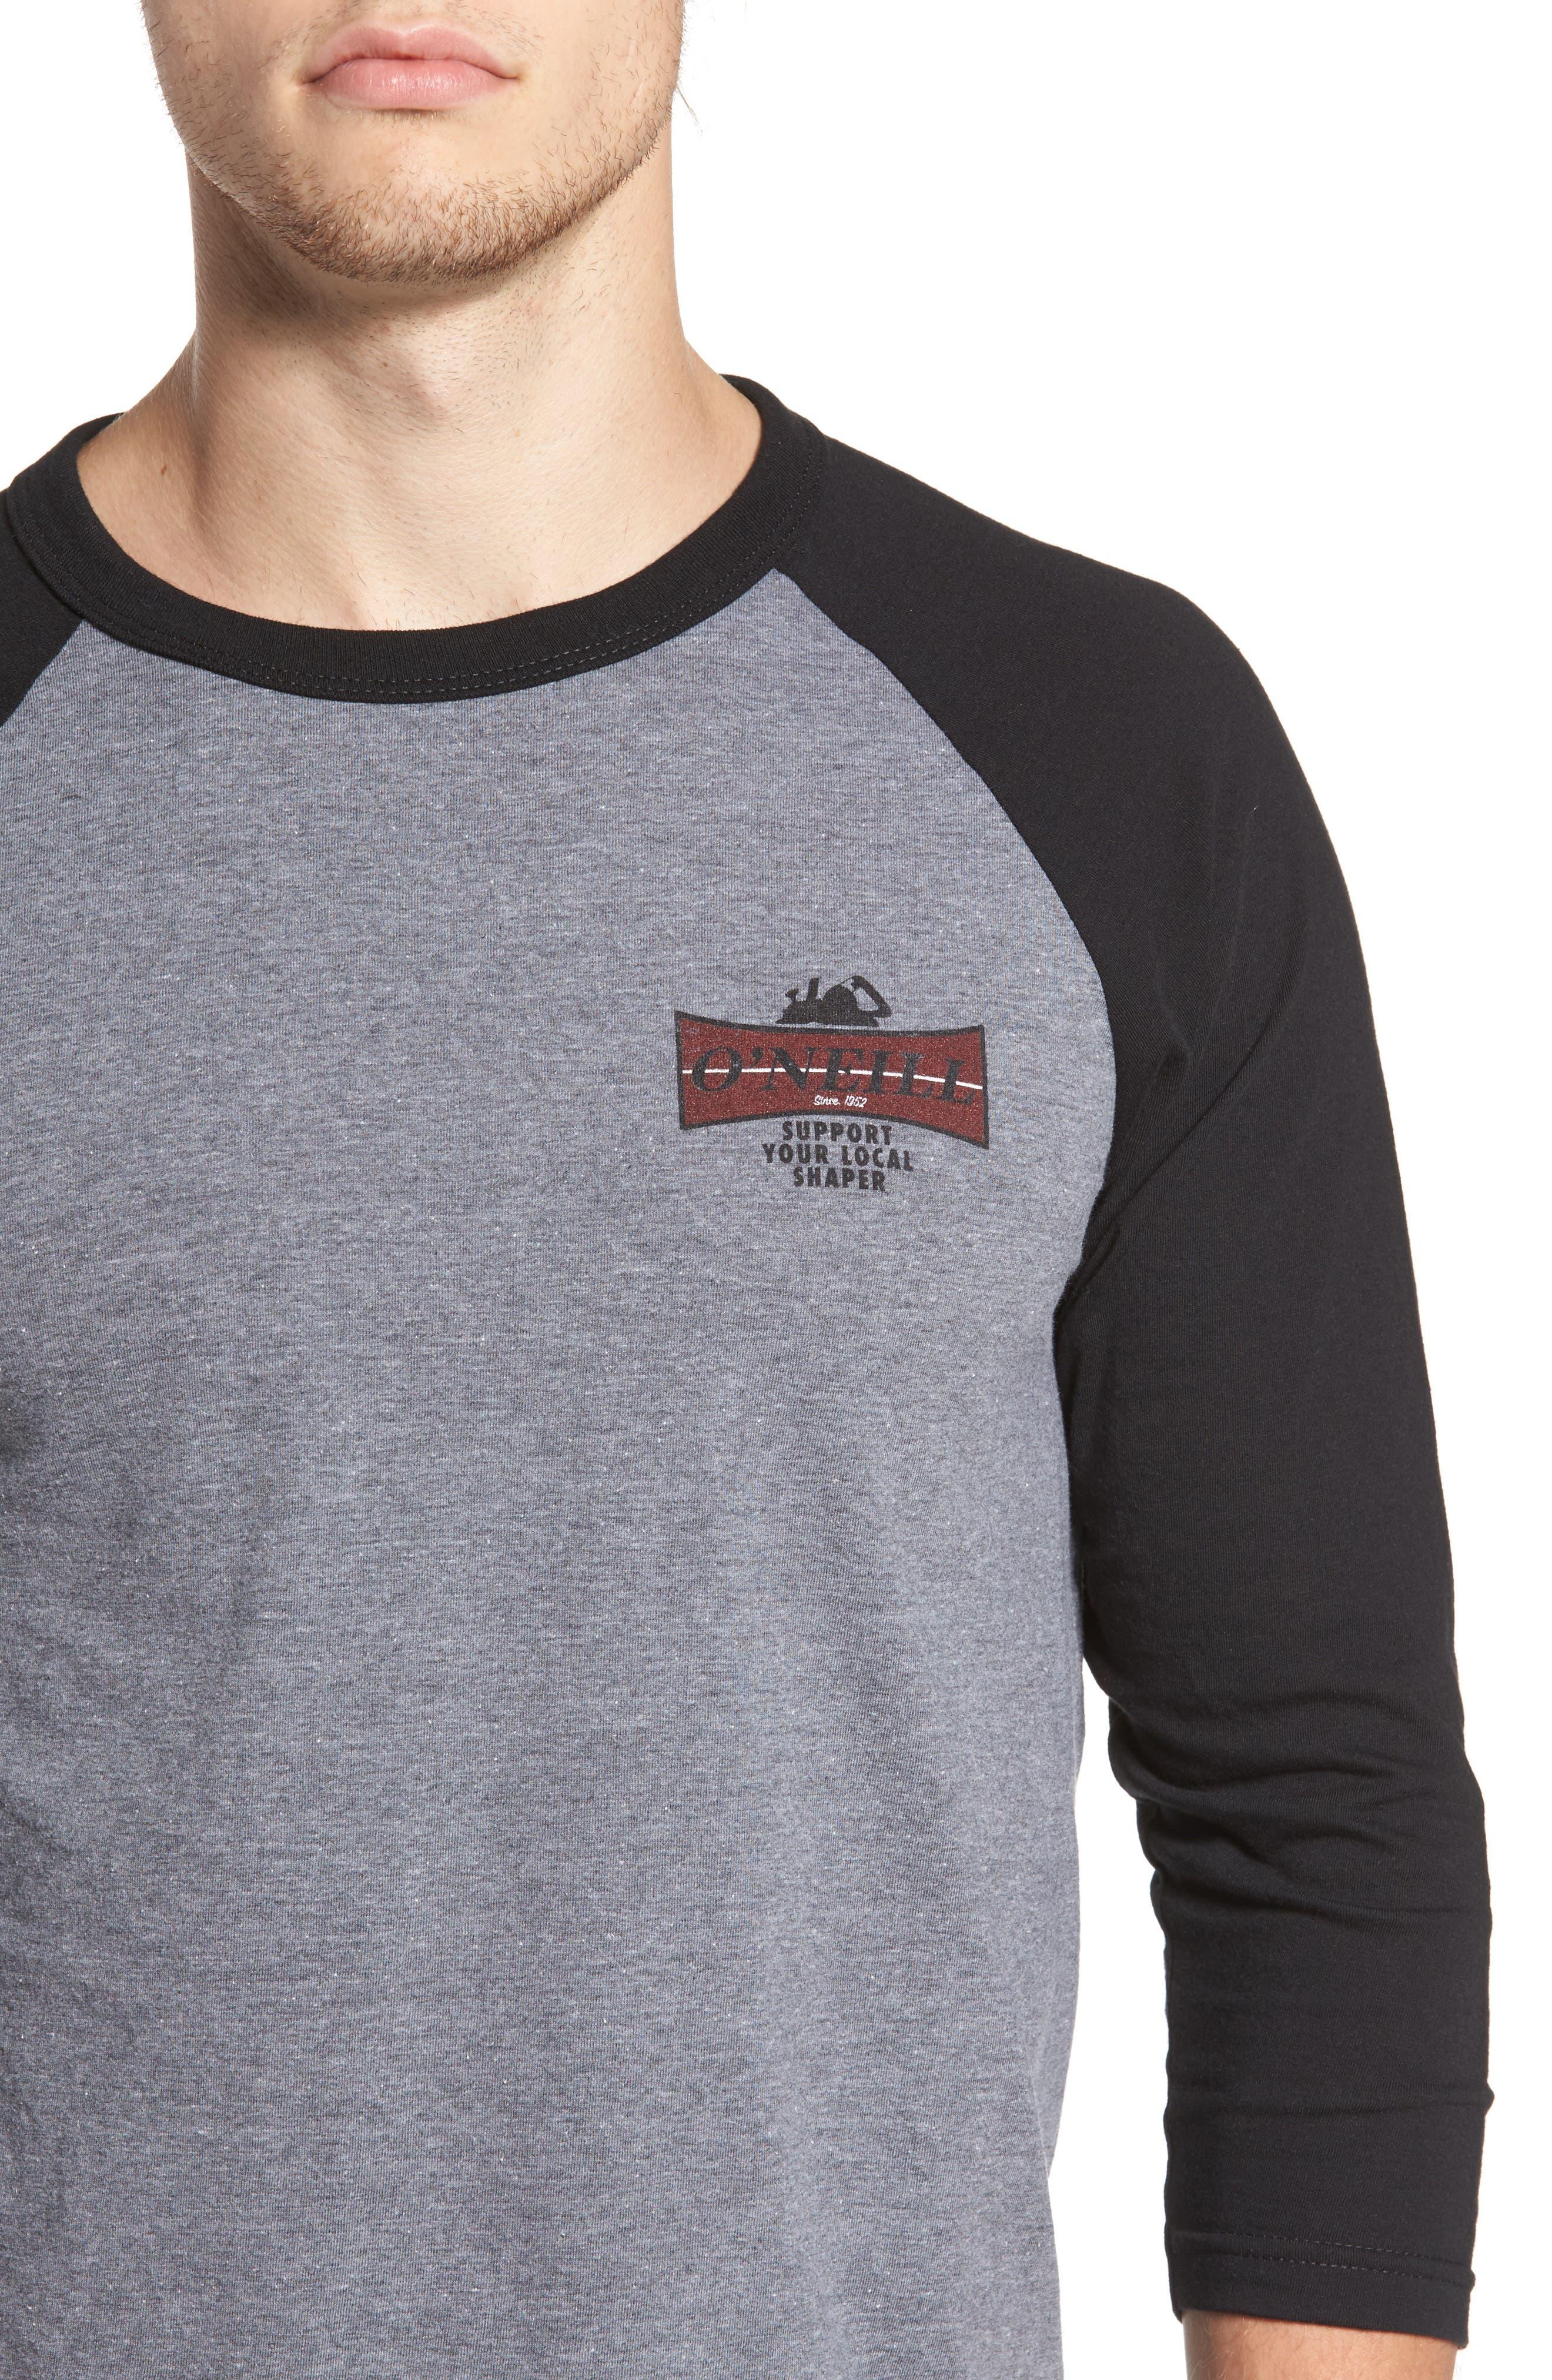 Planer Raglan T-Shirt,                             Alternate thumbnail 4, color,                             Grey W/ Black